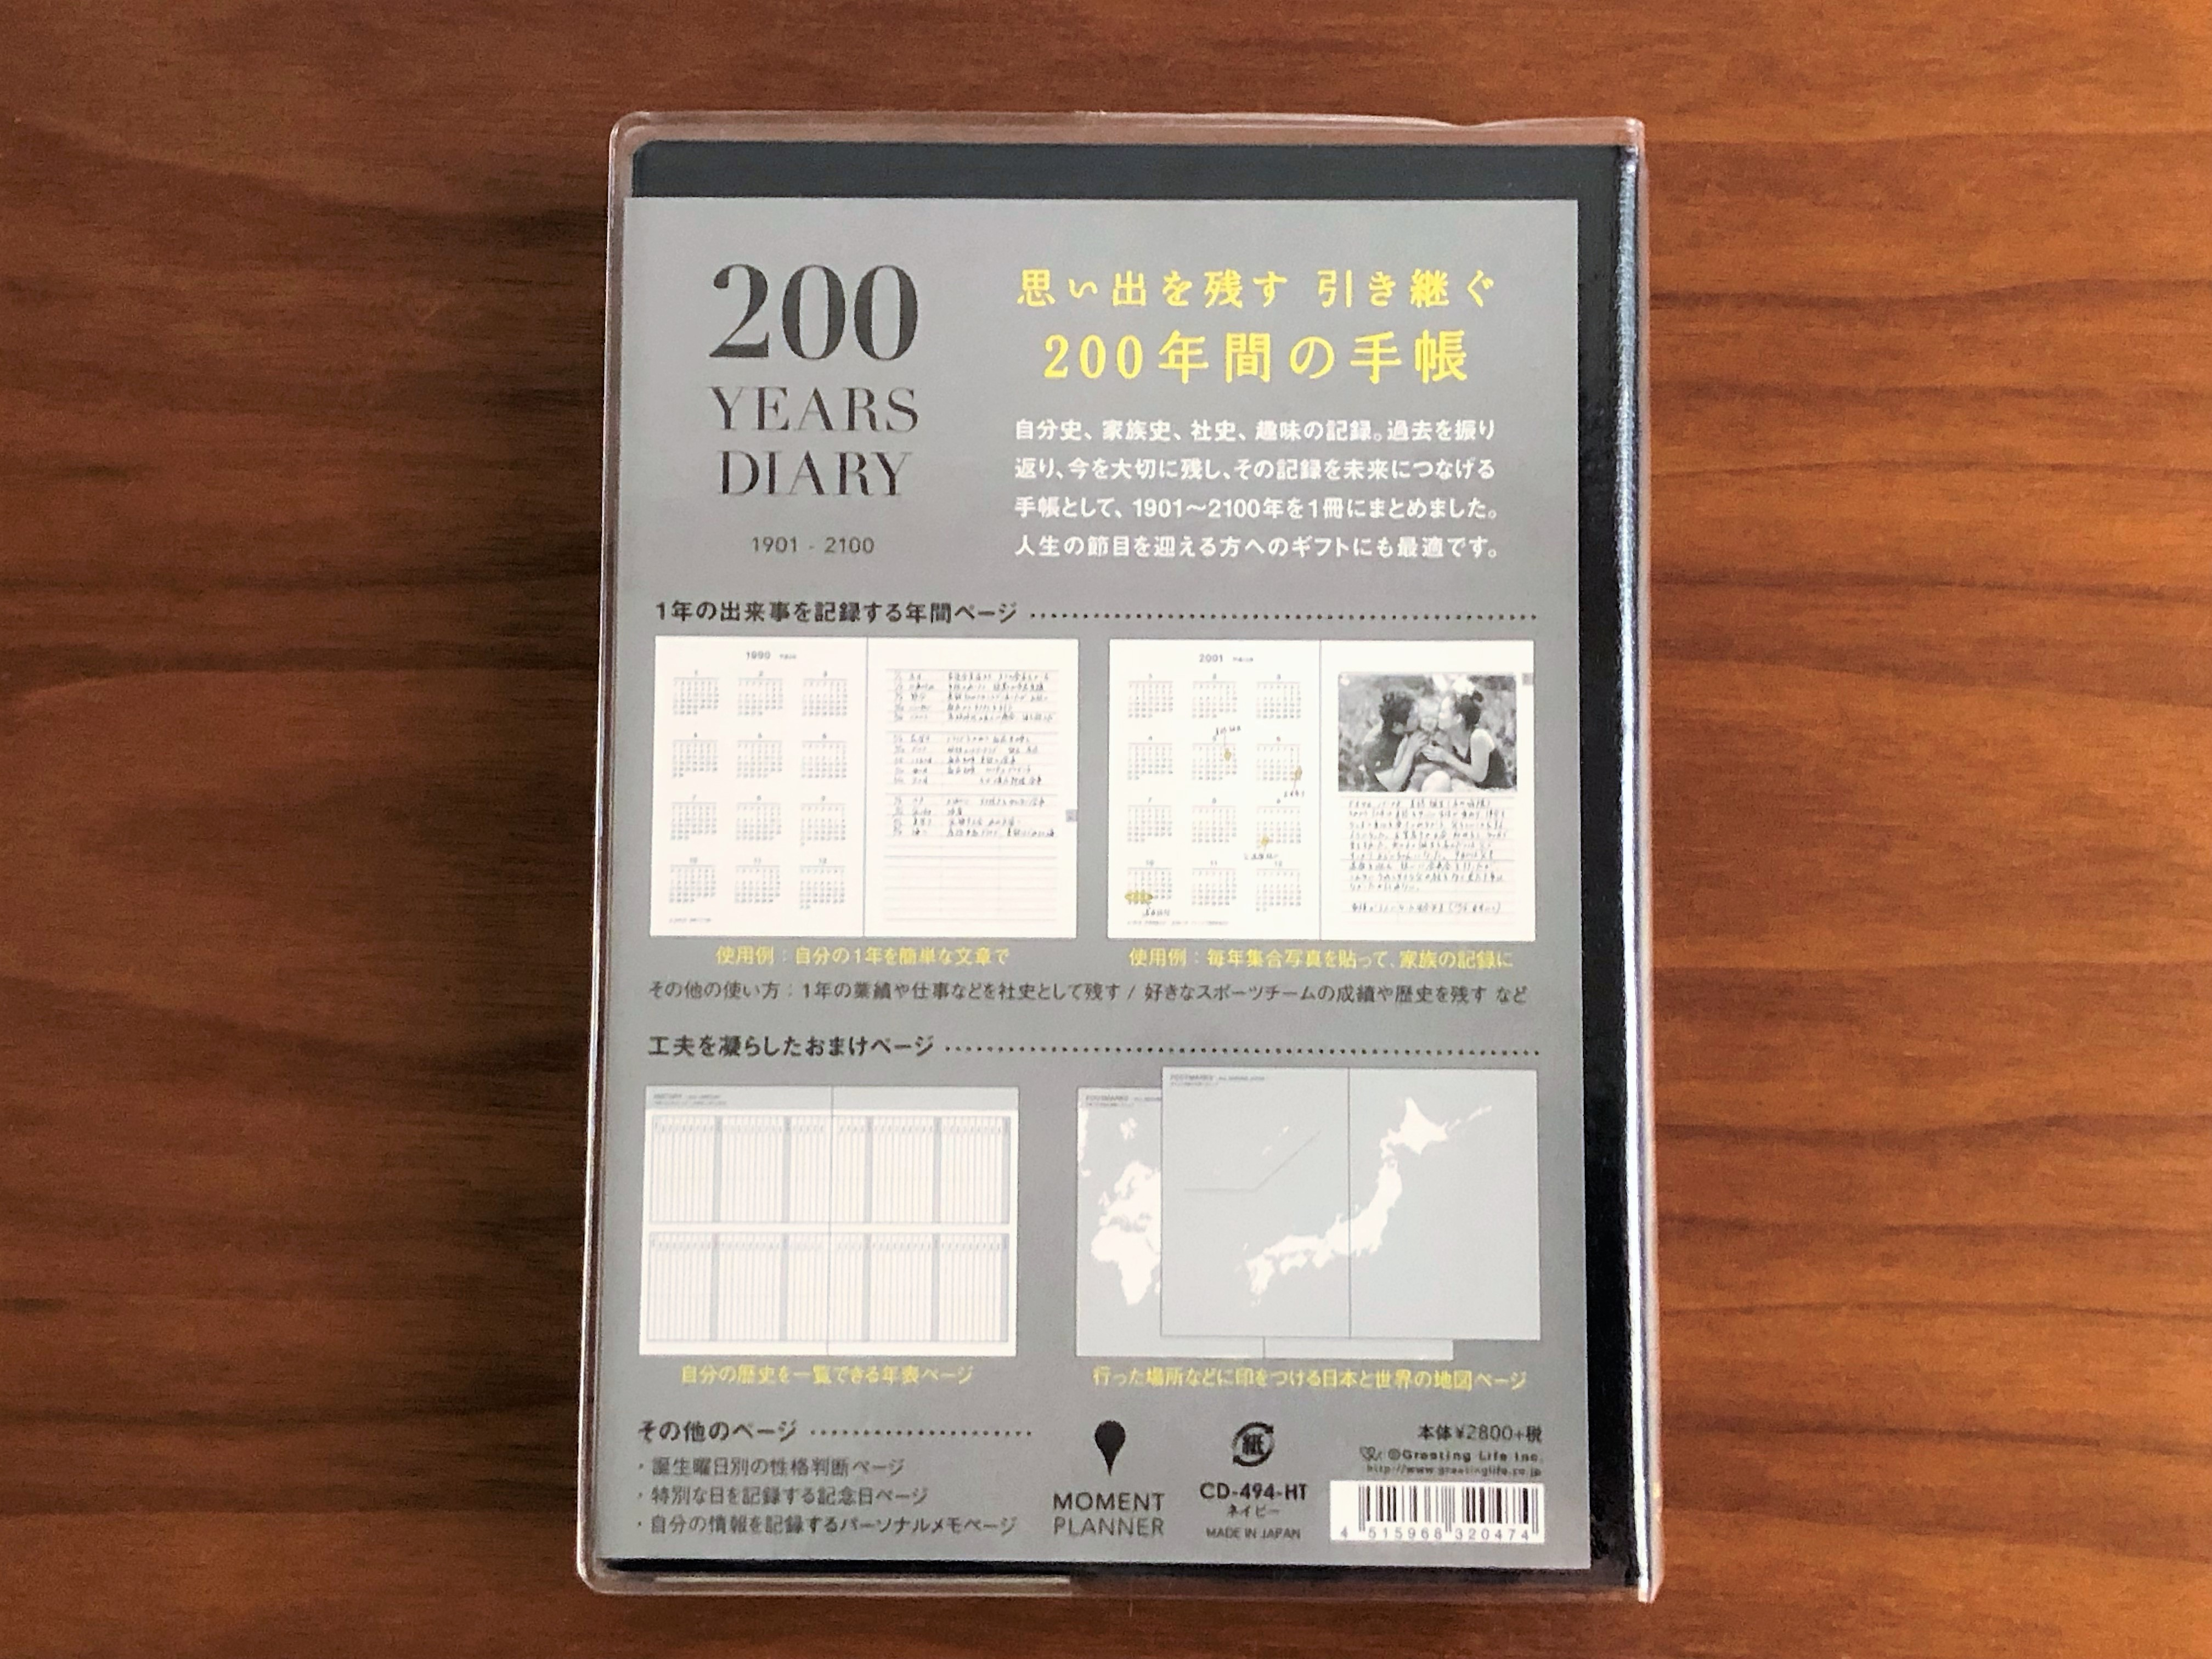 「200 YEARS DIARY」<200年カレンダー手帳>